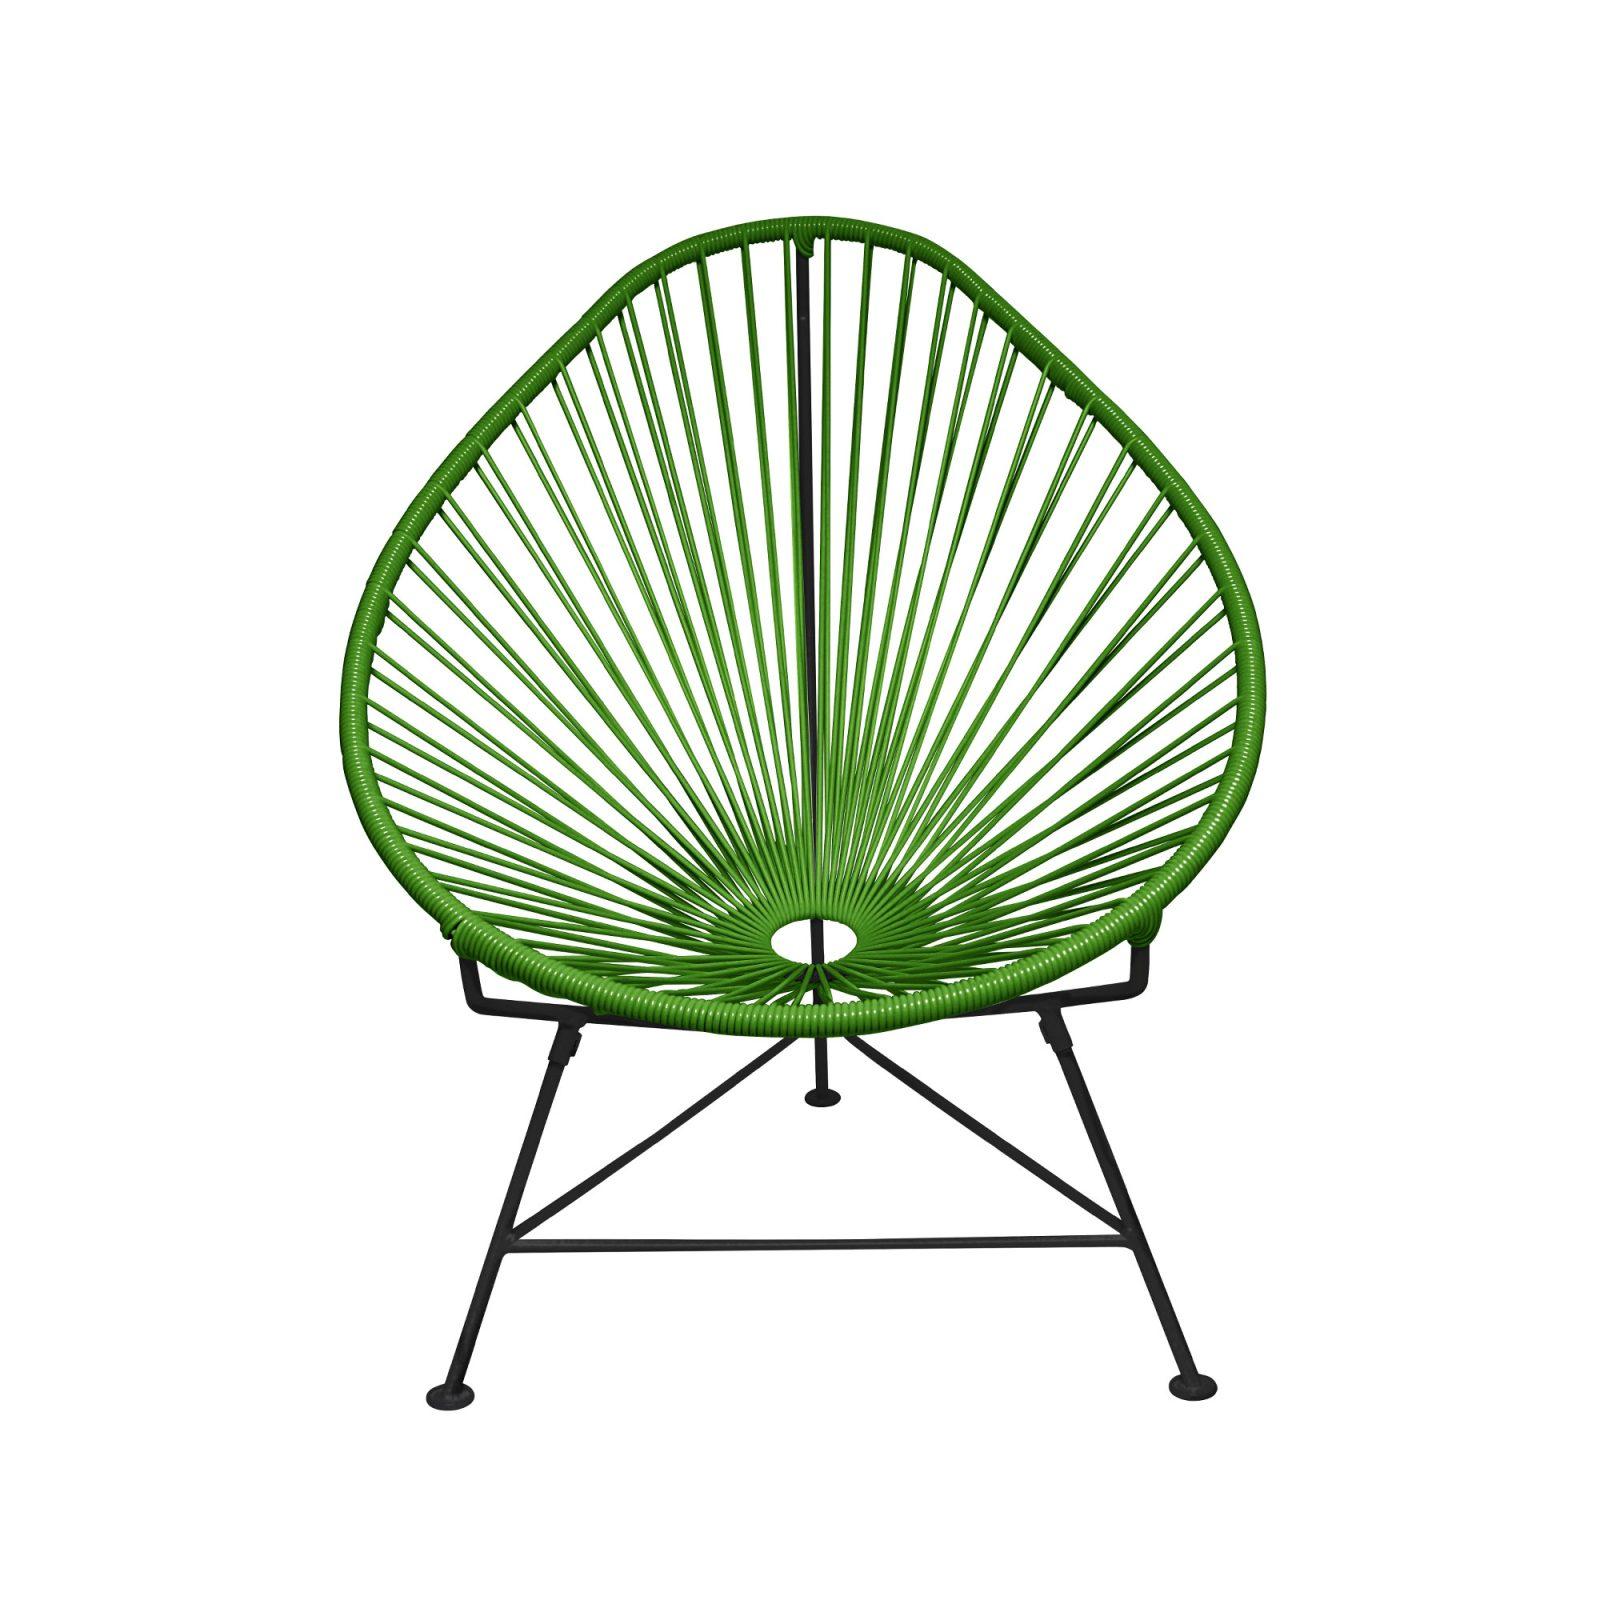 acapulco-chair-black-frame-cactus